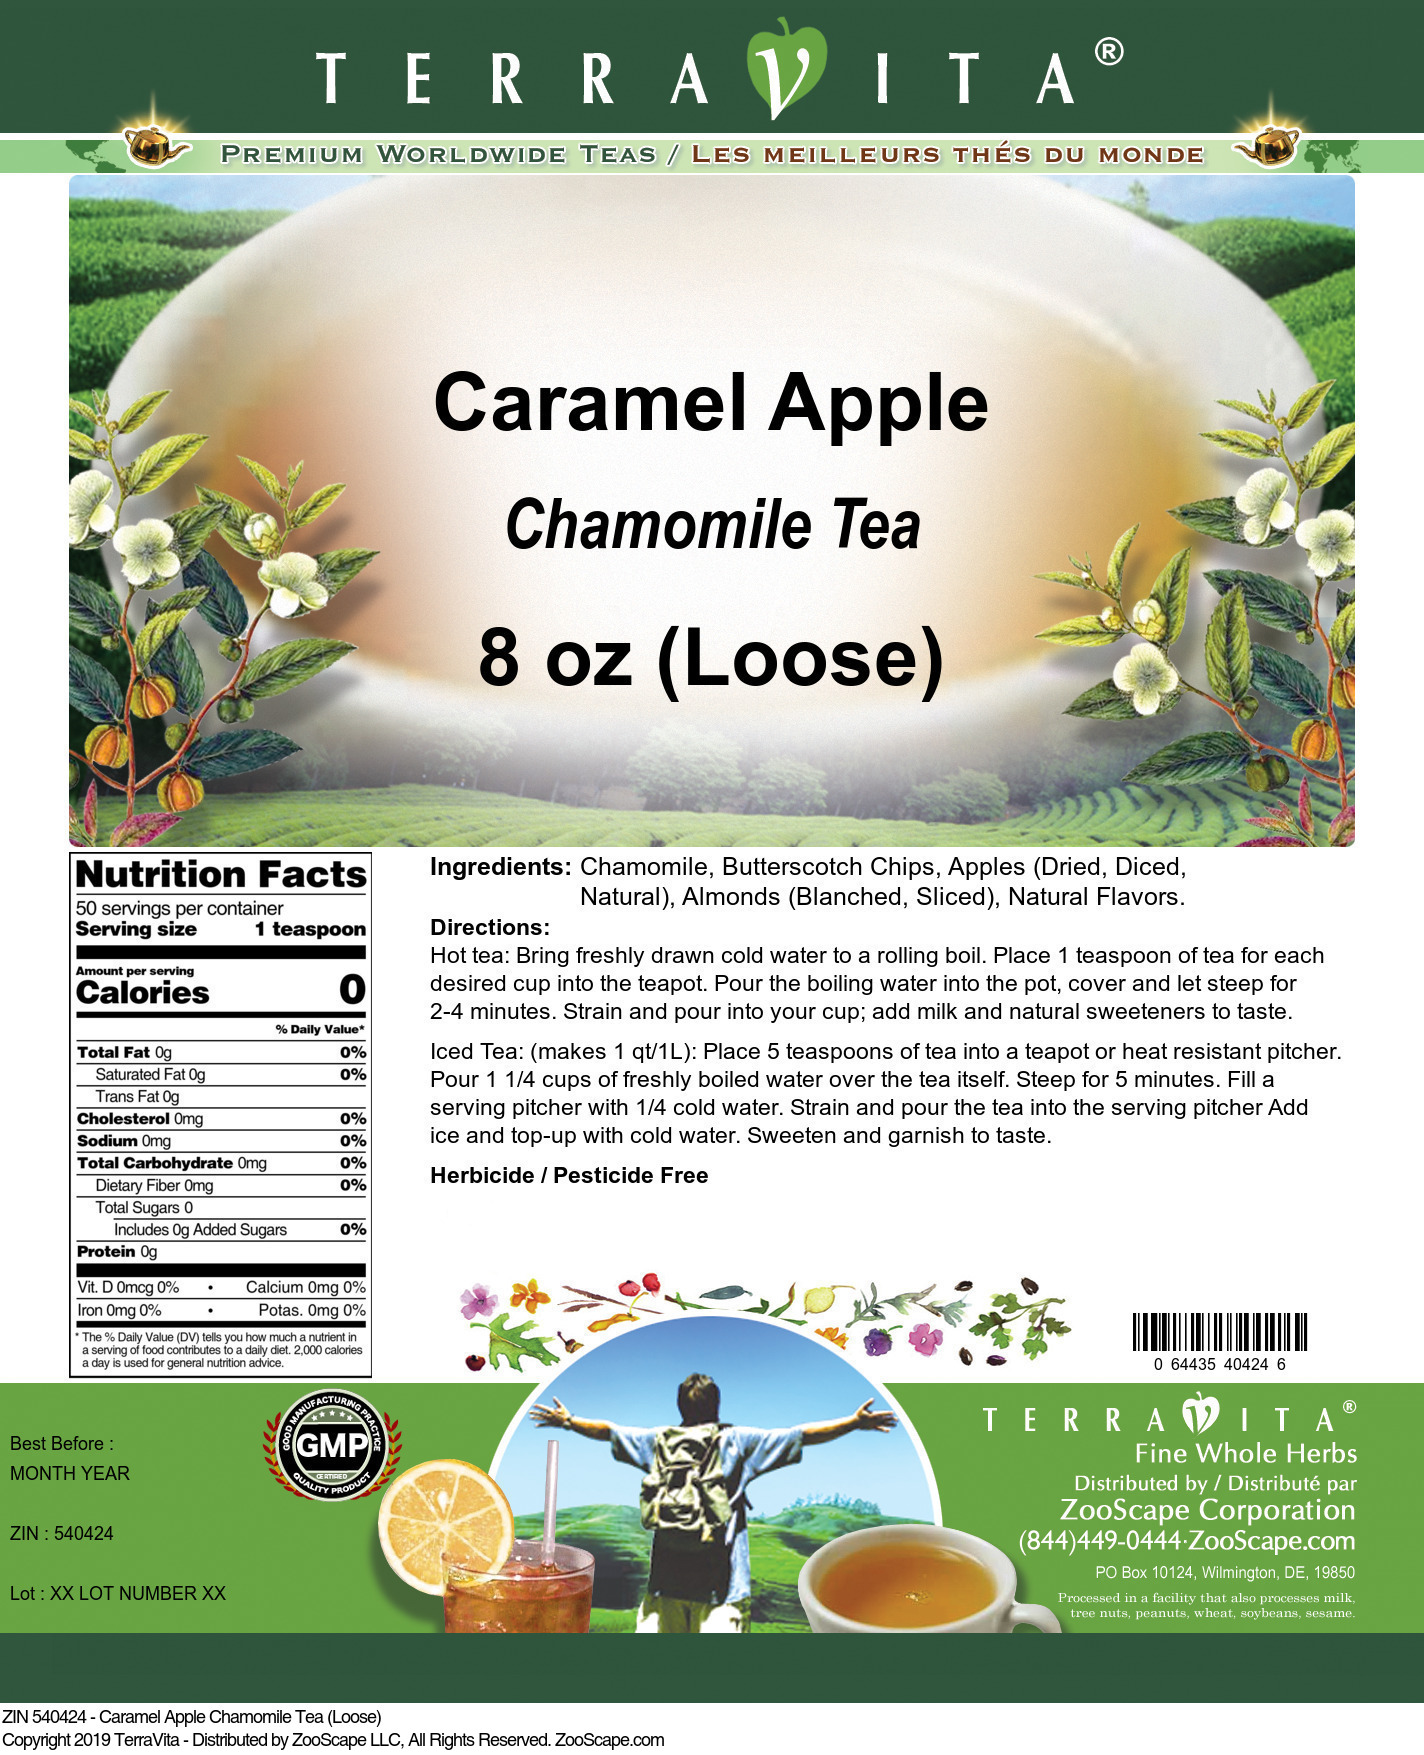 Caramel Apple Chamomile Tea (Loose)